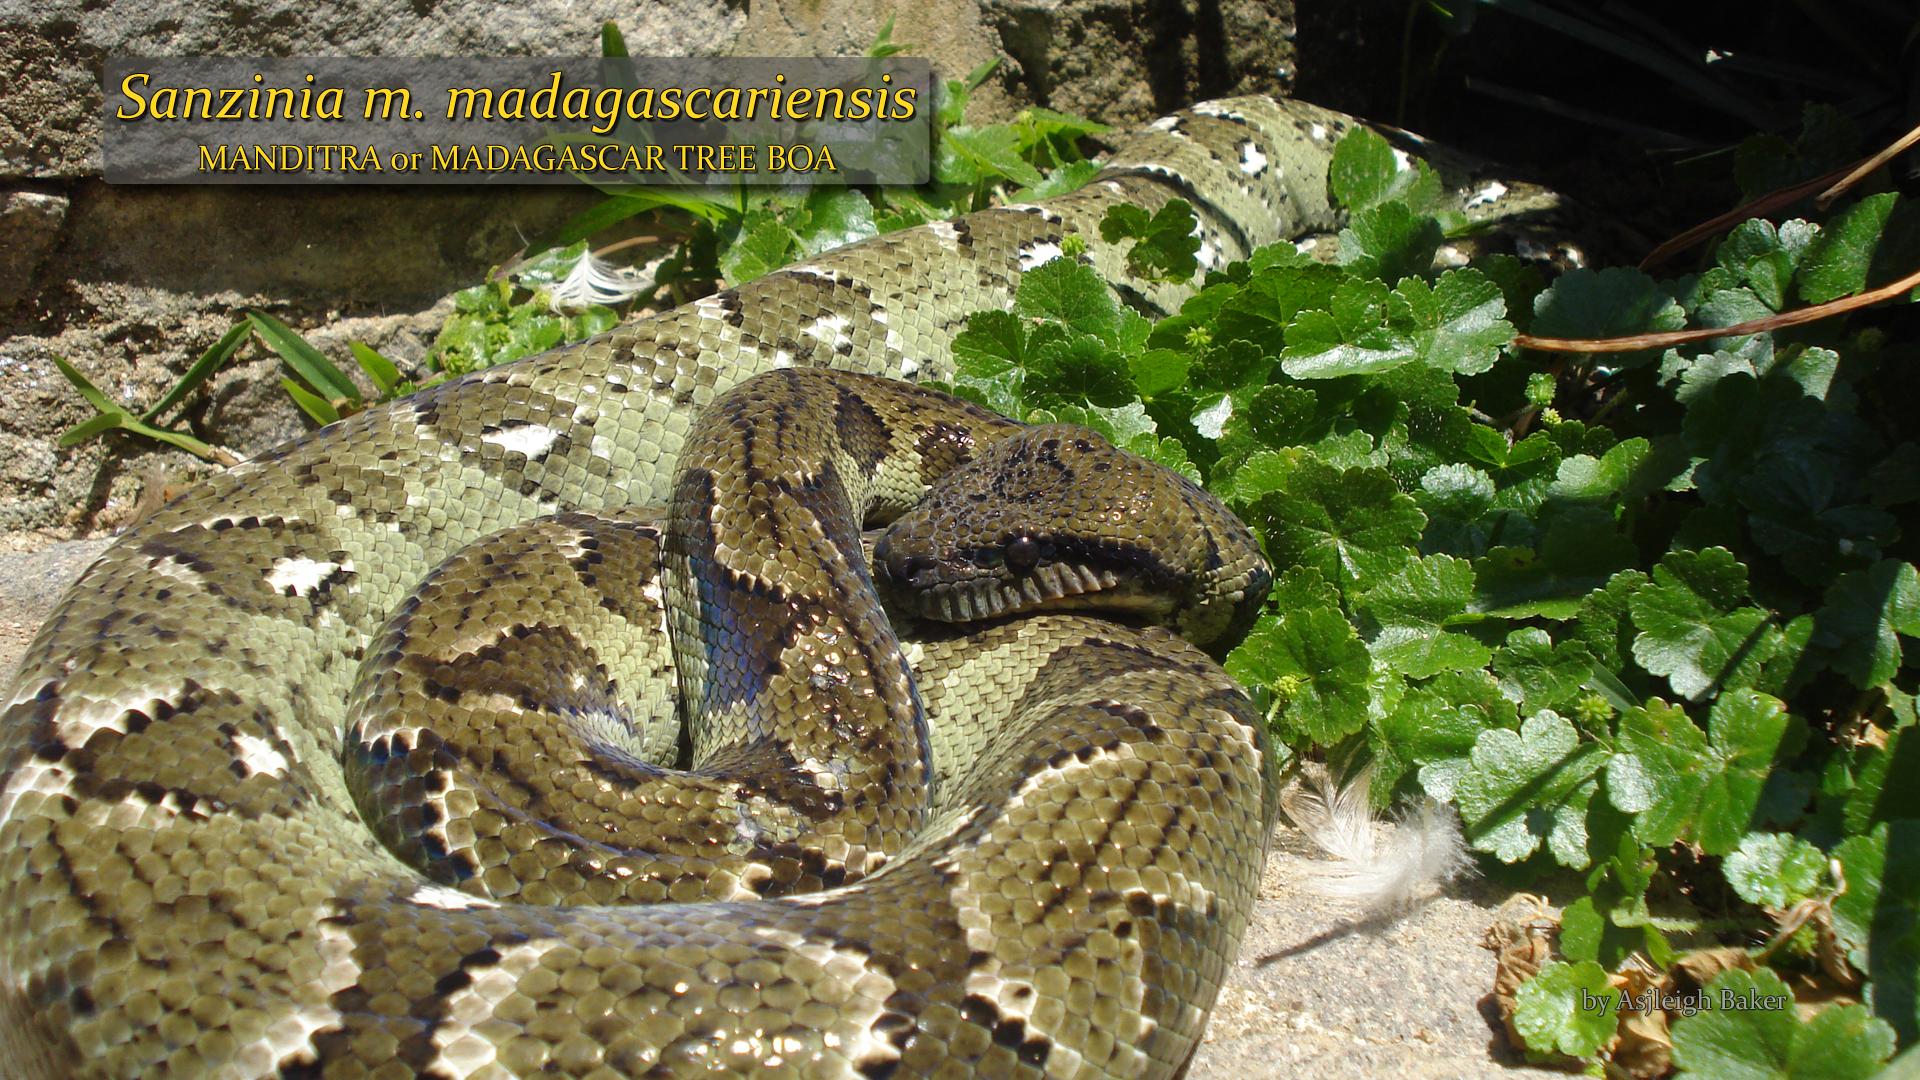 Sanzinia madagascariensis- Ashleigh Baker.jpg